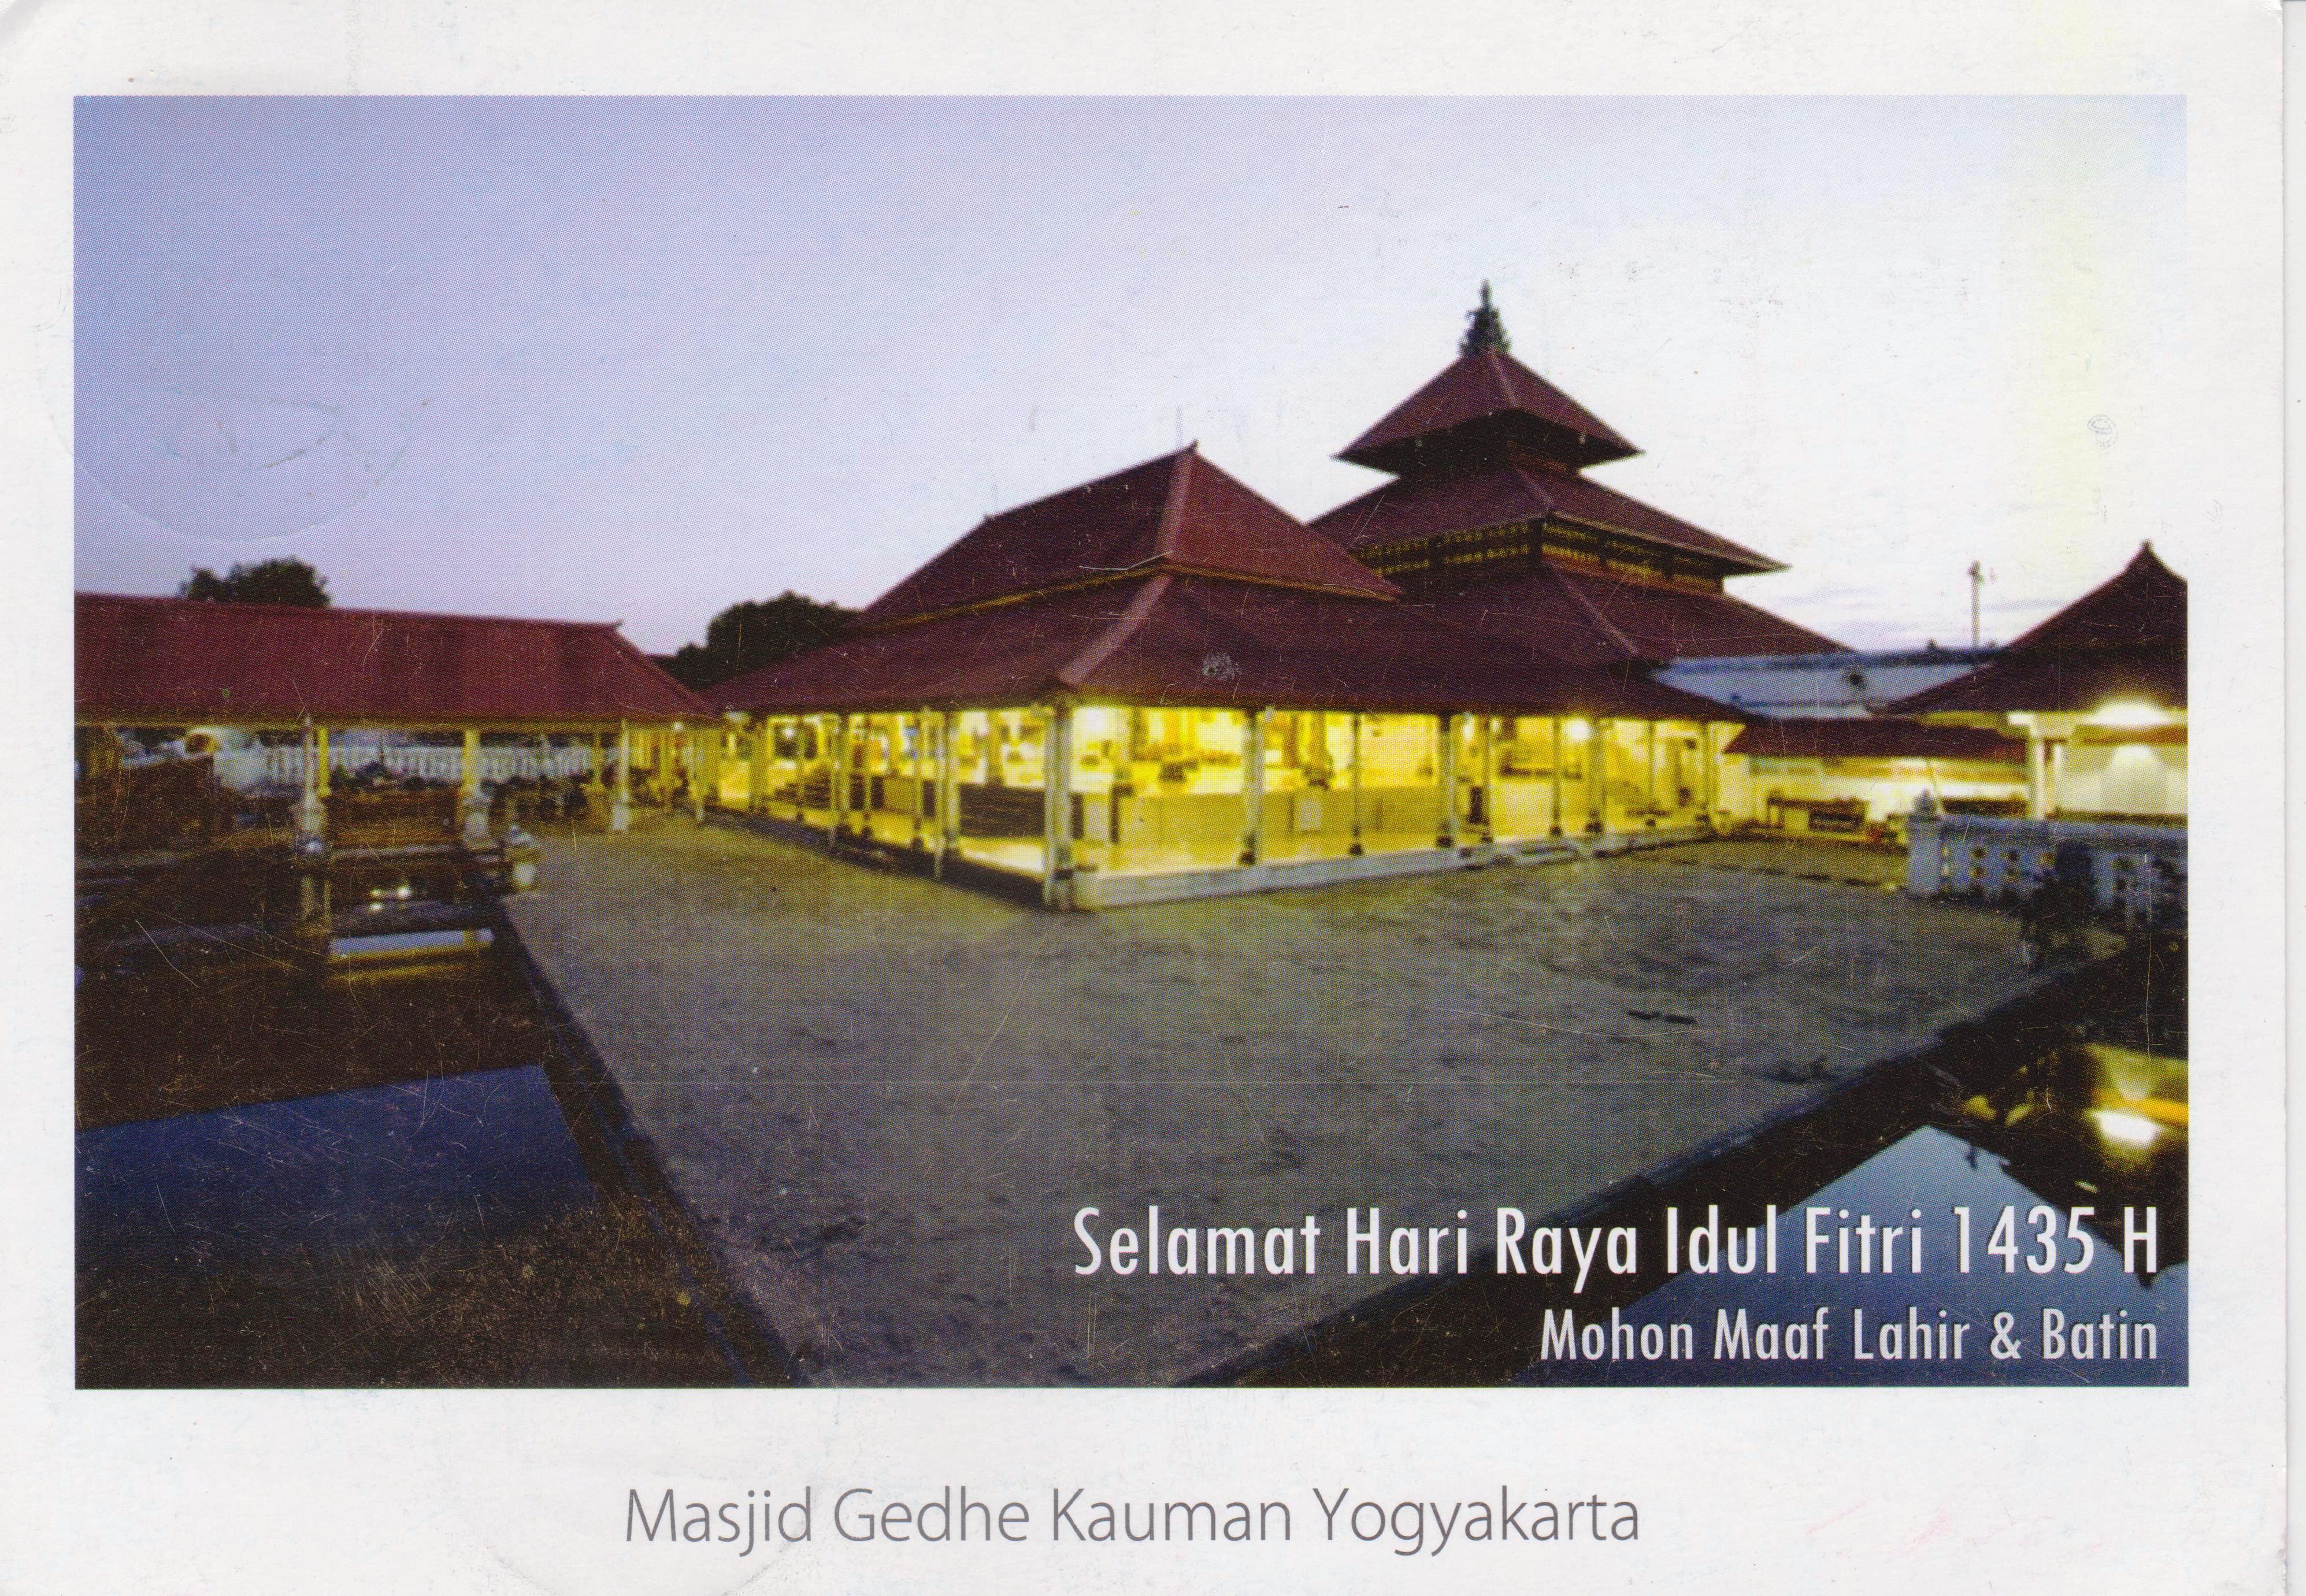 Masjid Gedhe Kauman Yogyakarta Hqeem Stamps Kartupos Bergambar Resmi Diterbitkan